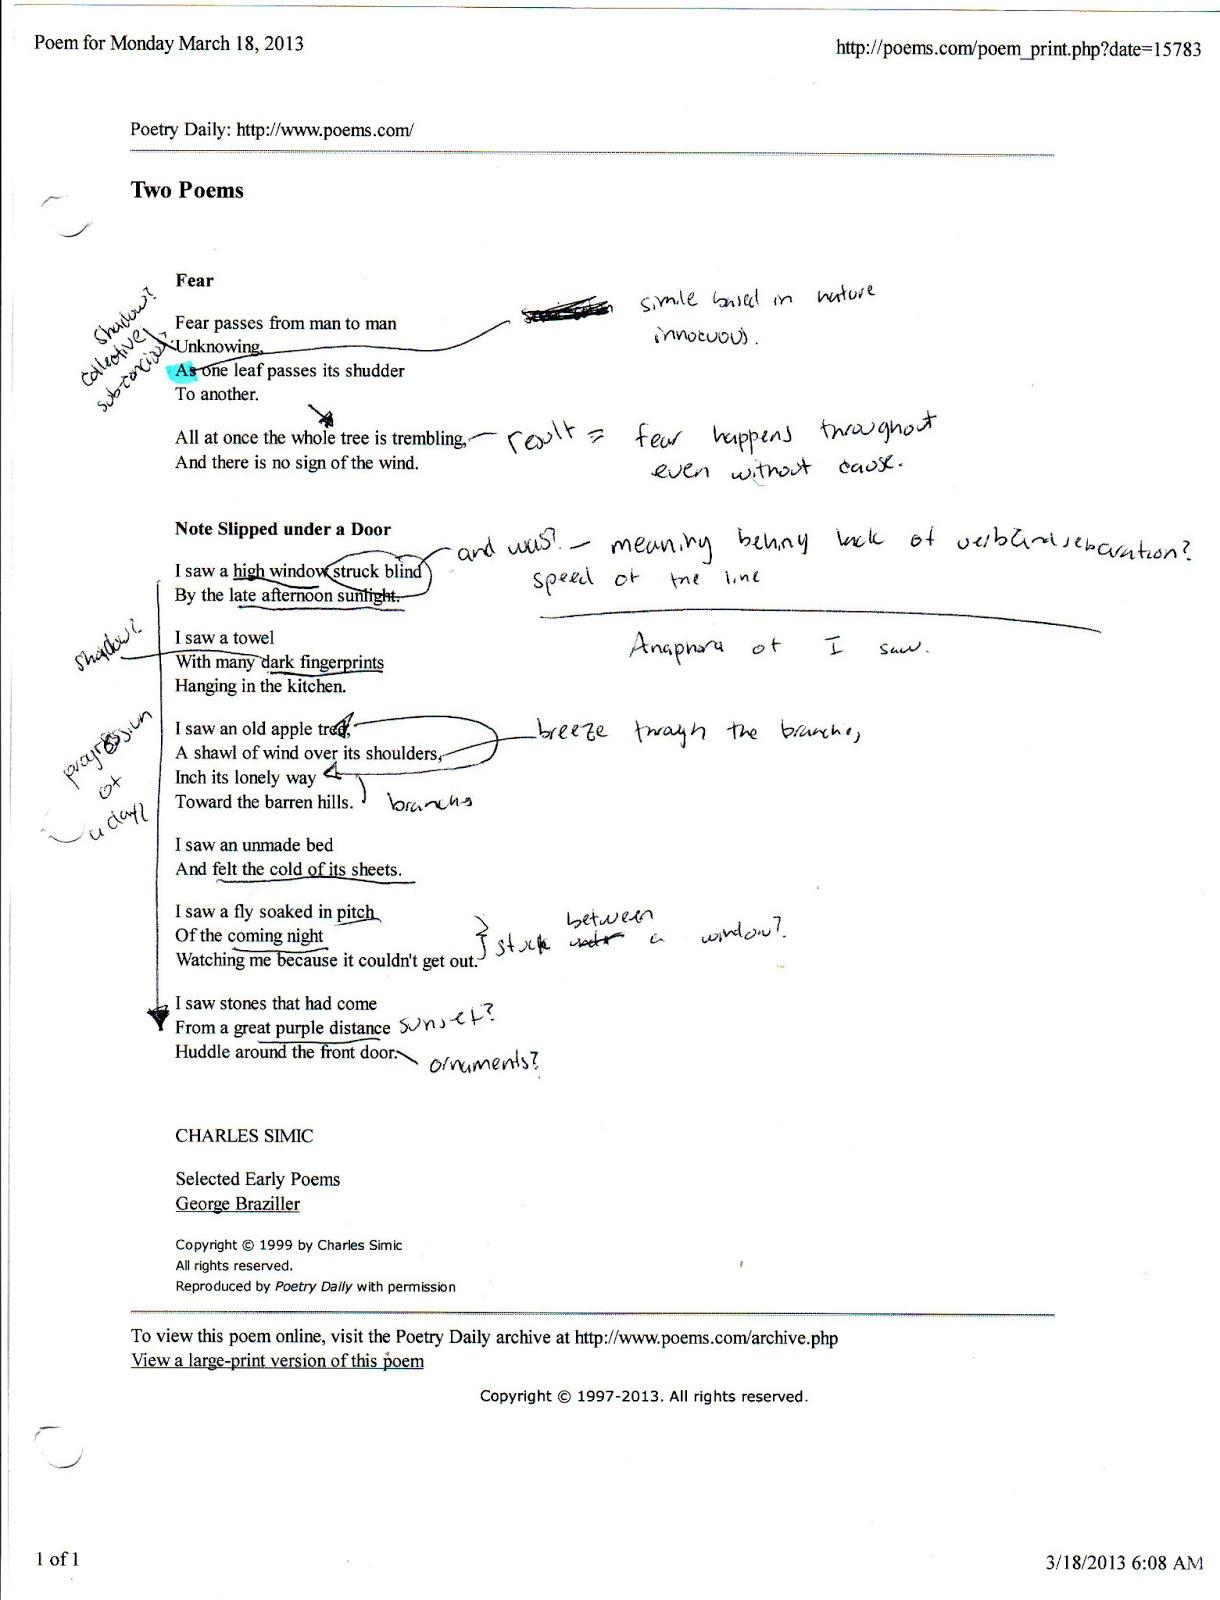 writing a curriculum vitae poem professional resumes sample online writing a curriculum vitae poem resume poems examples of resume poetry those winter sundays analysis homework